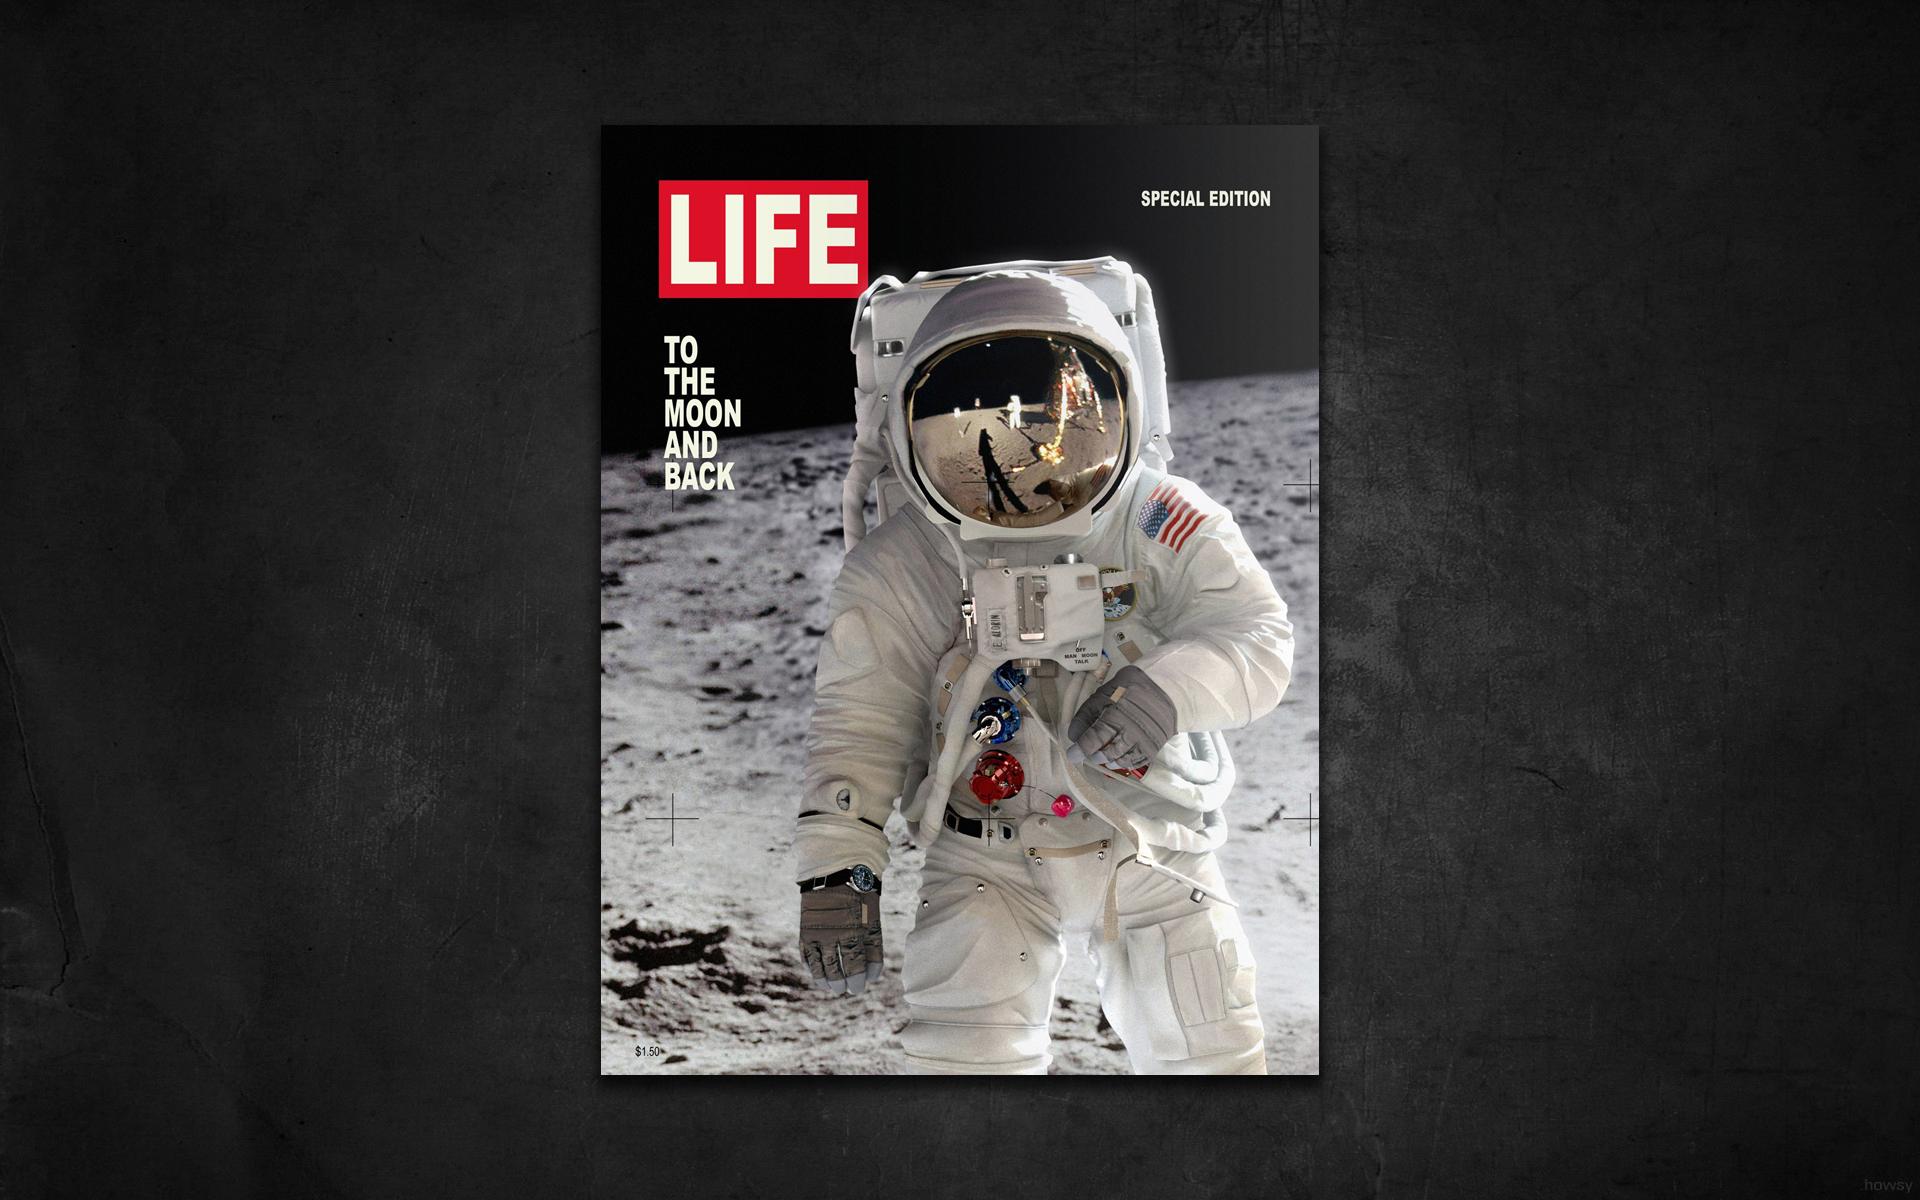 Free Download Life Magazine Wallpaper 1920x1200 Life